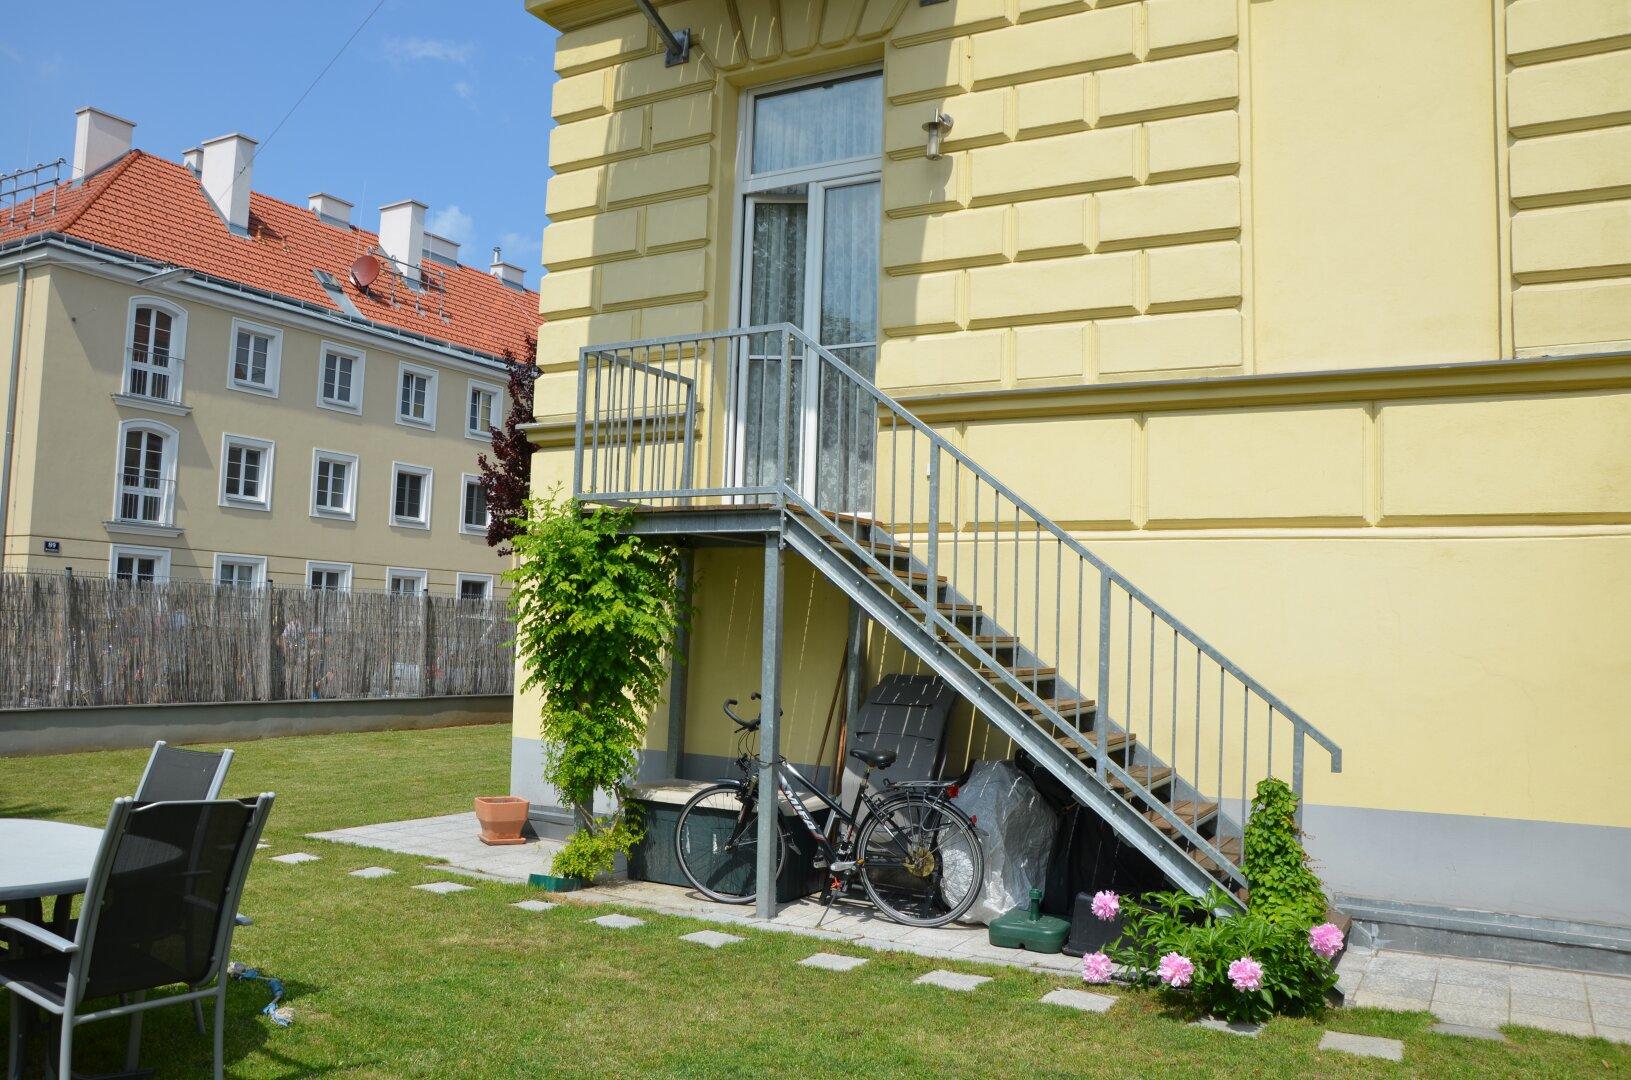 Treppe zum Eigengarten